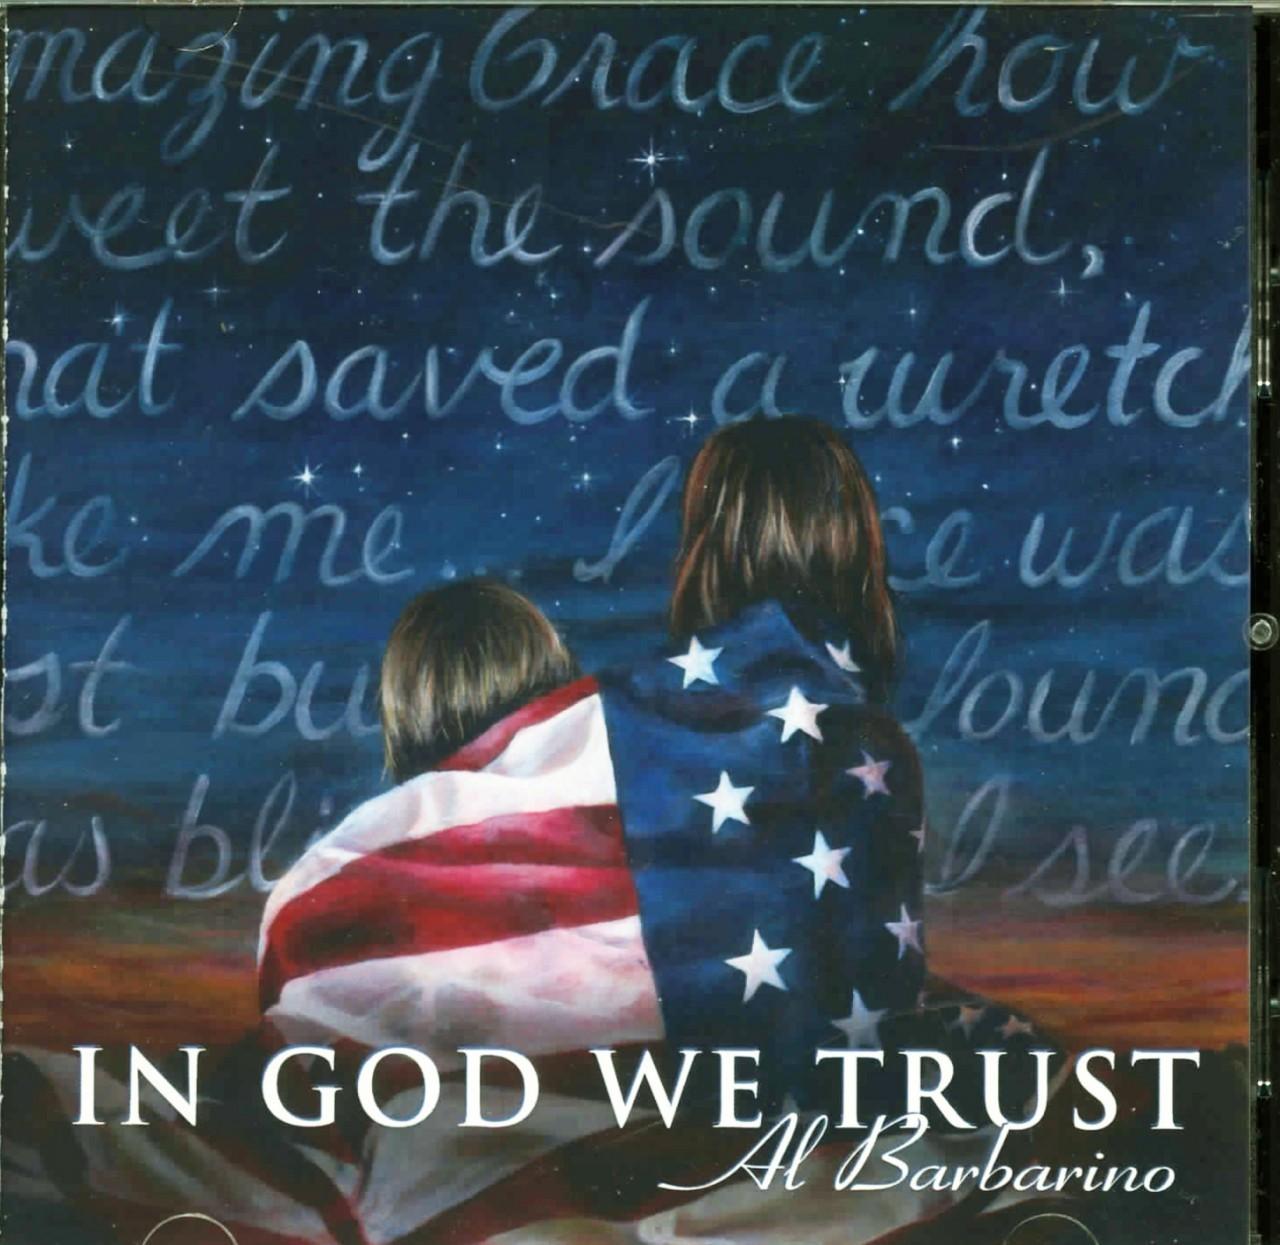 In god we trust by al barbarino